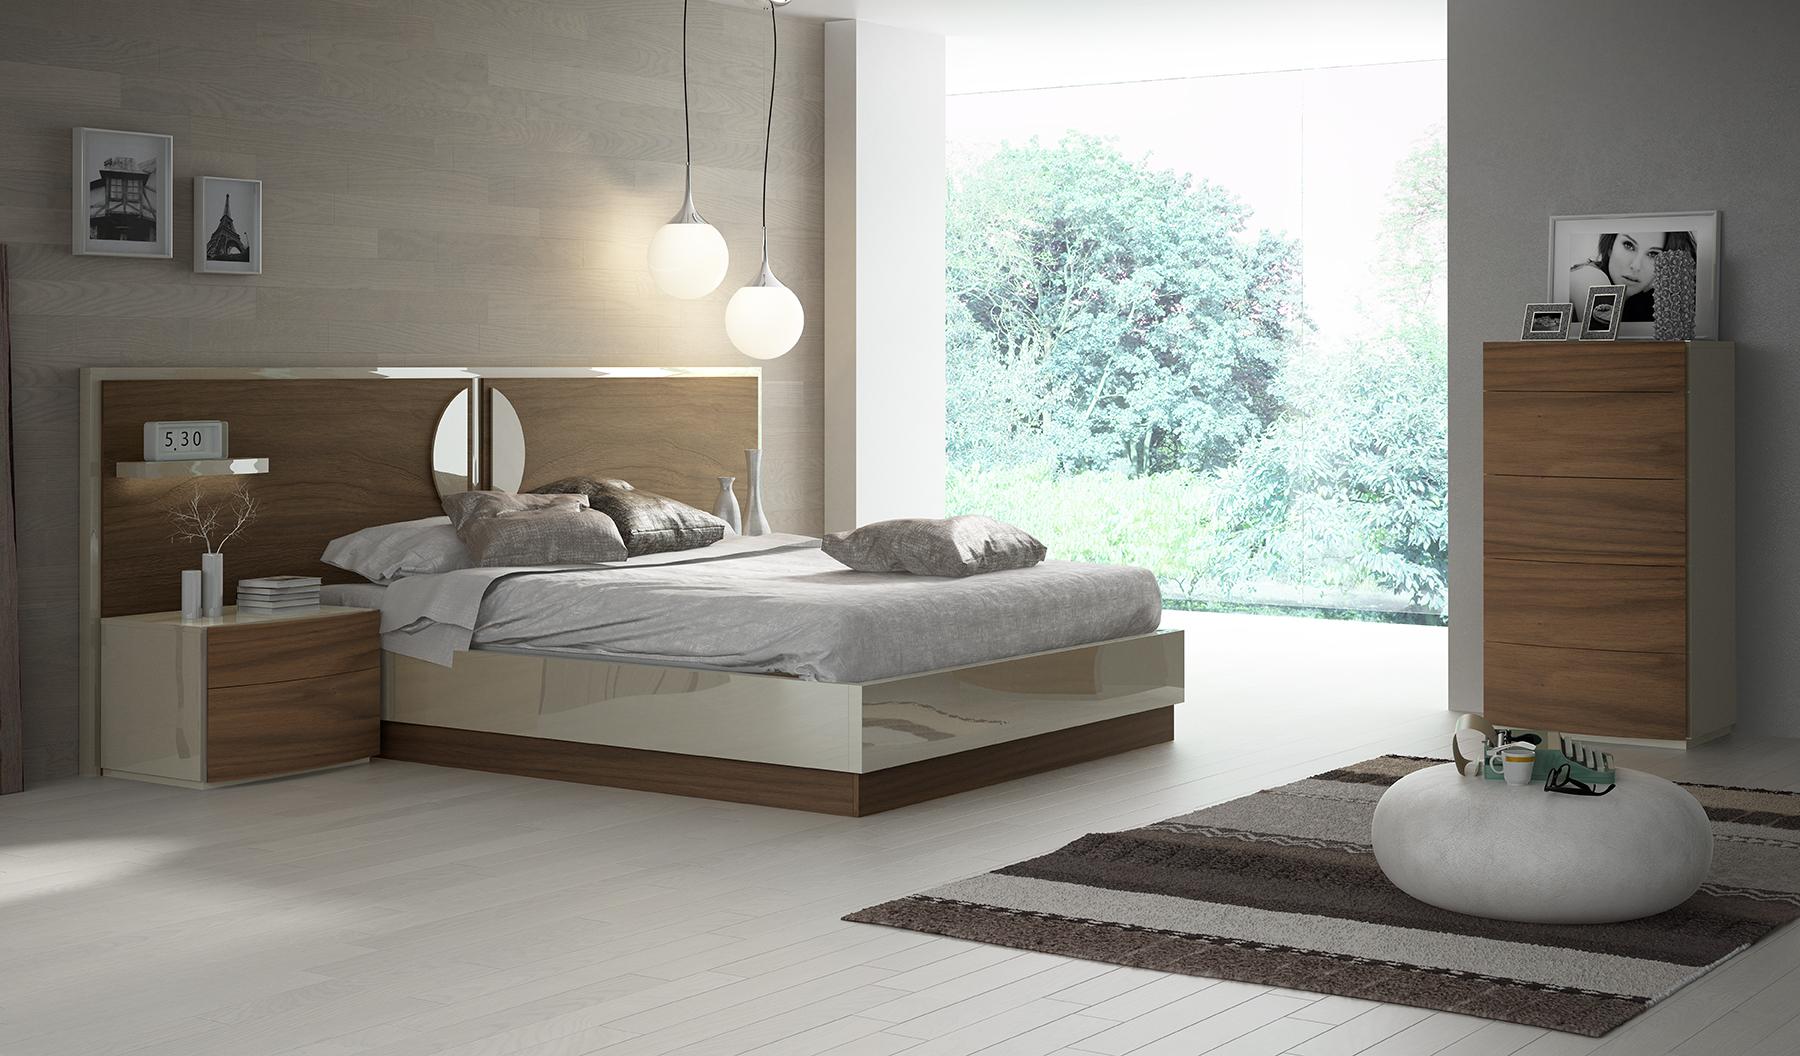 Fenicia Composition 68 / comp 502, Fenicia Modern Bedroom Sets ...